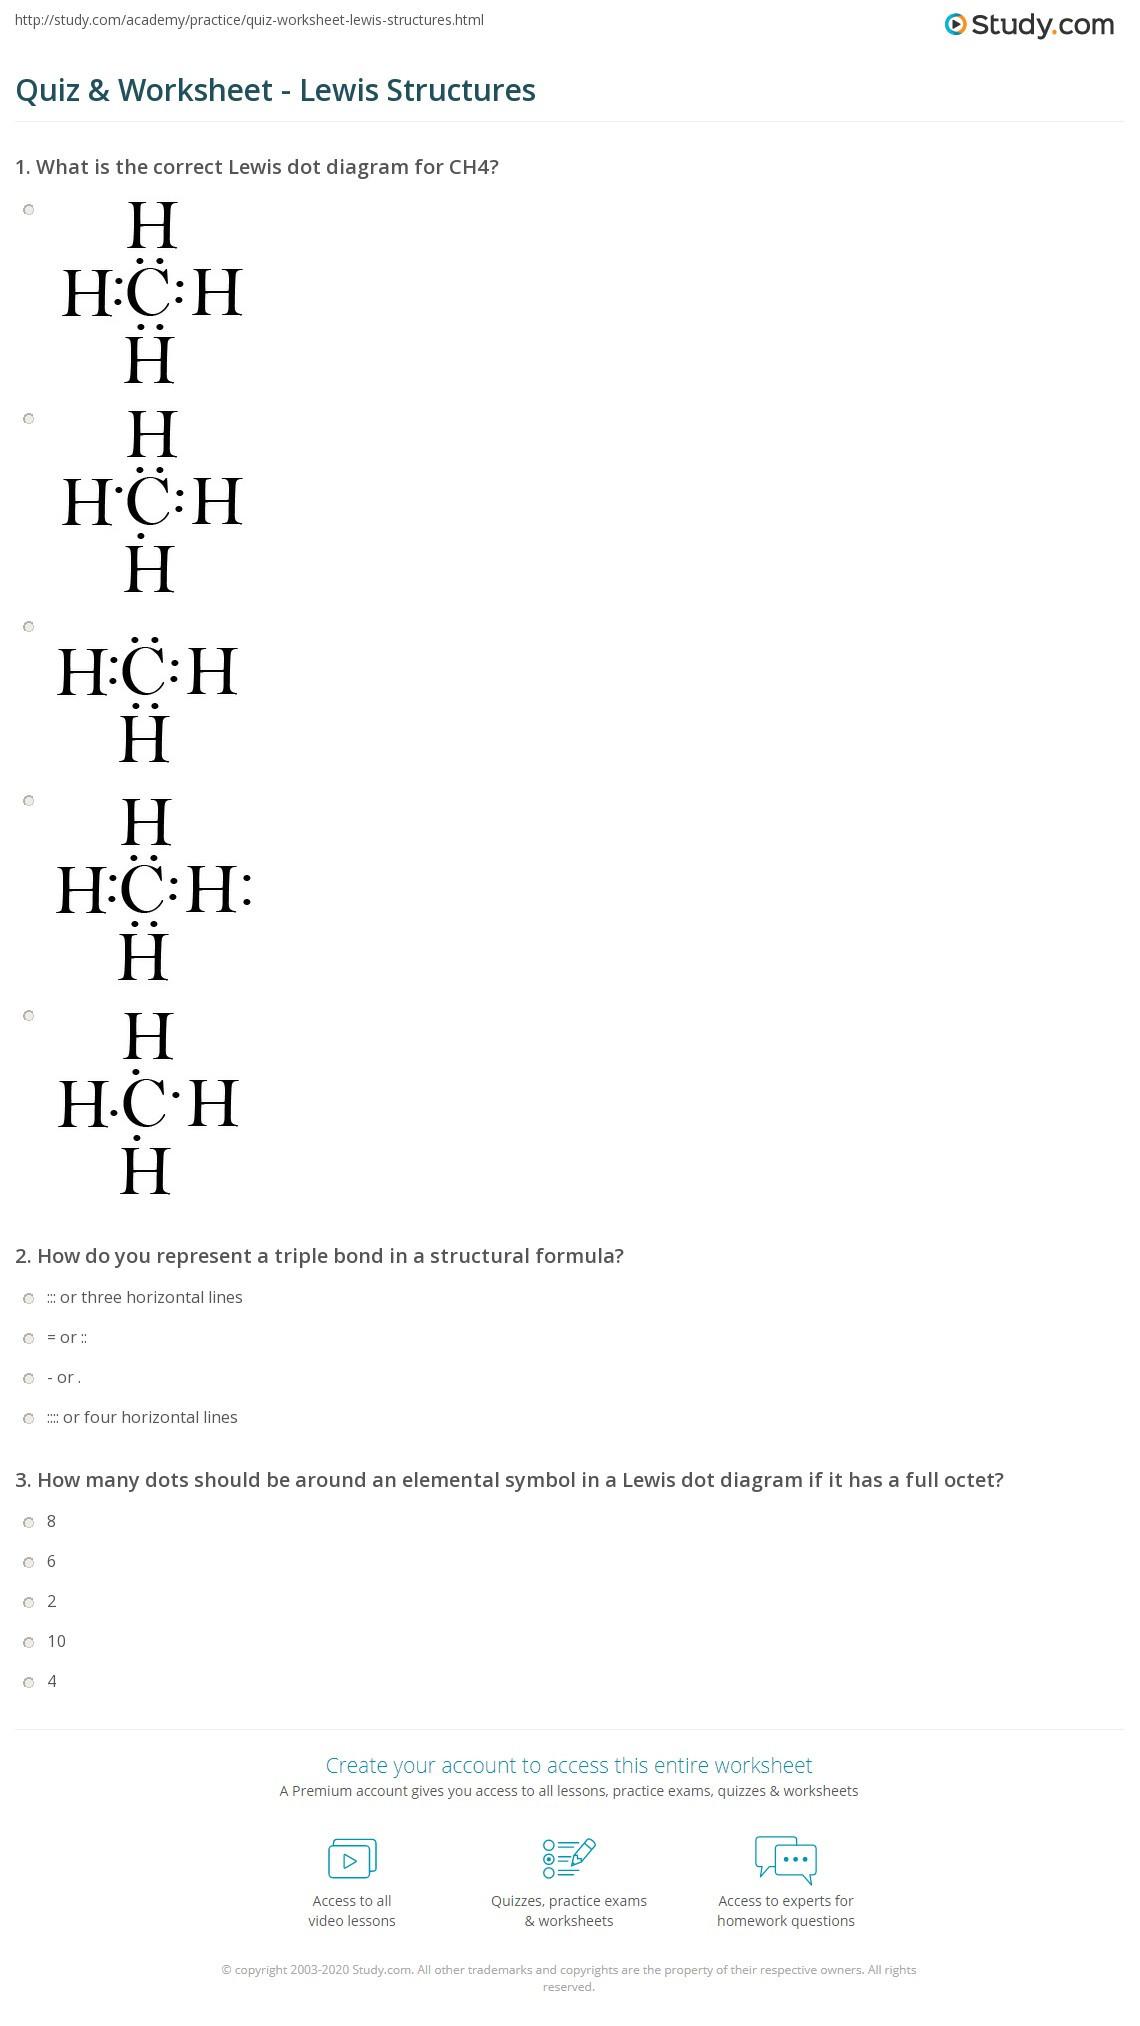 Drawing Lewis Structures Worksheet Quiz & Worksheet Lewis Structures